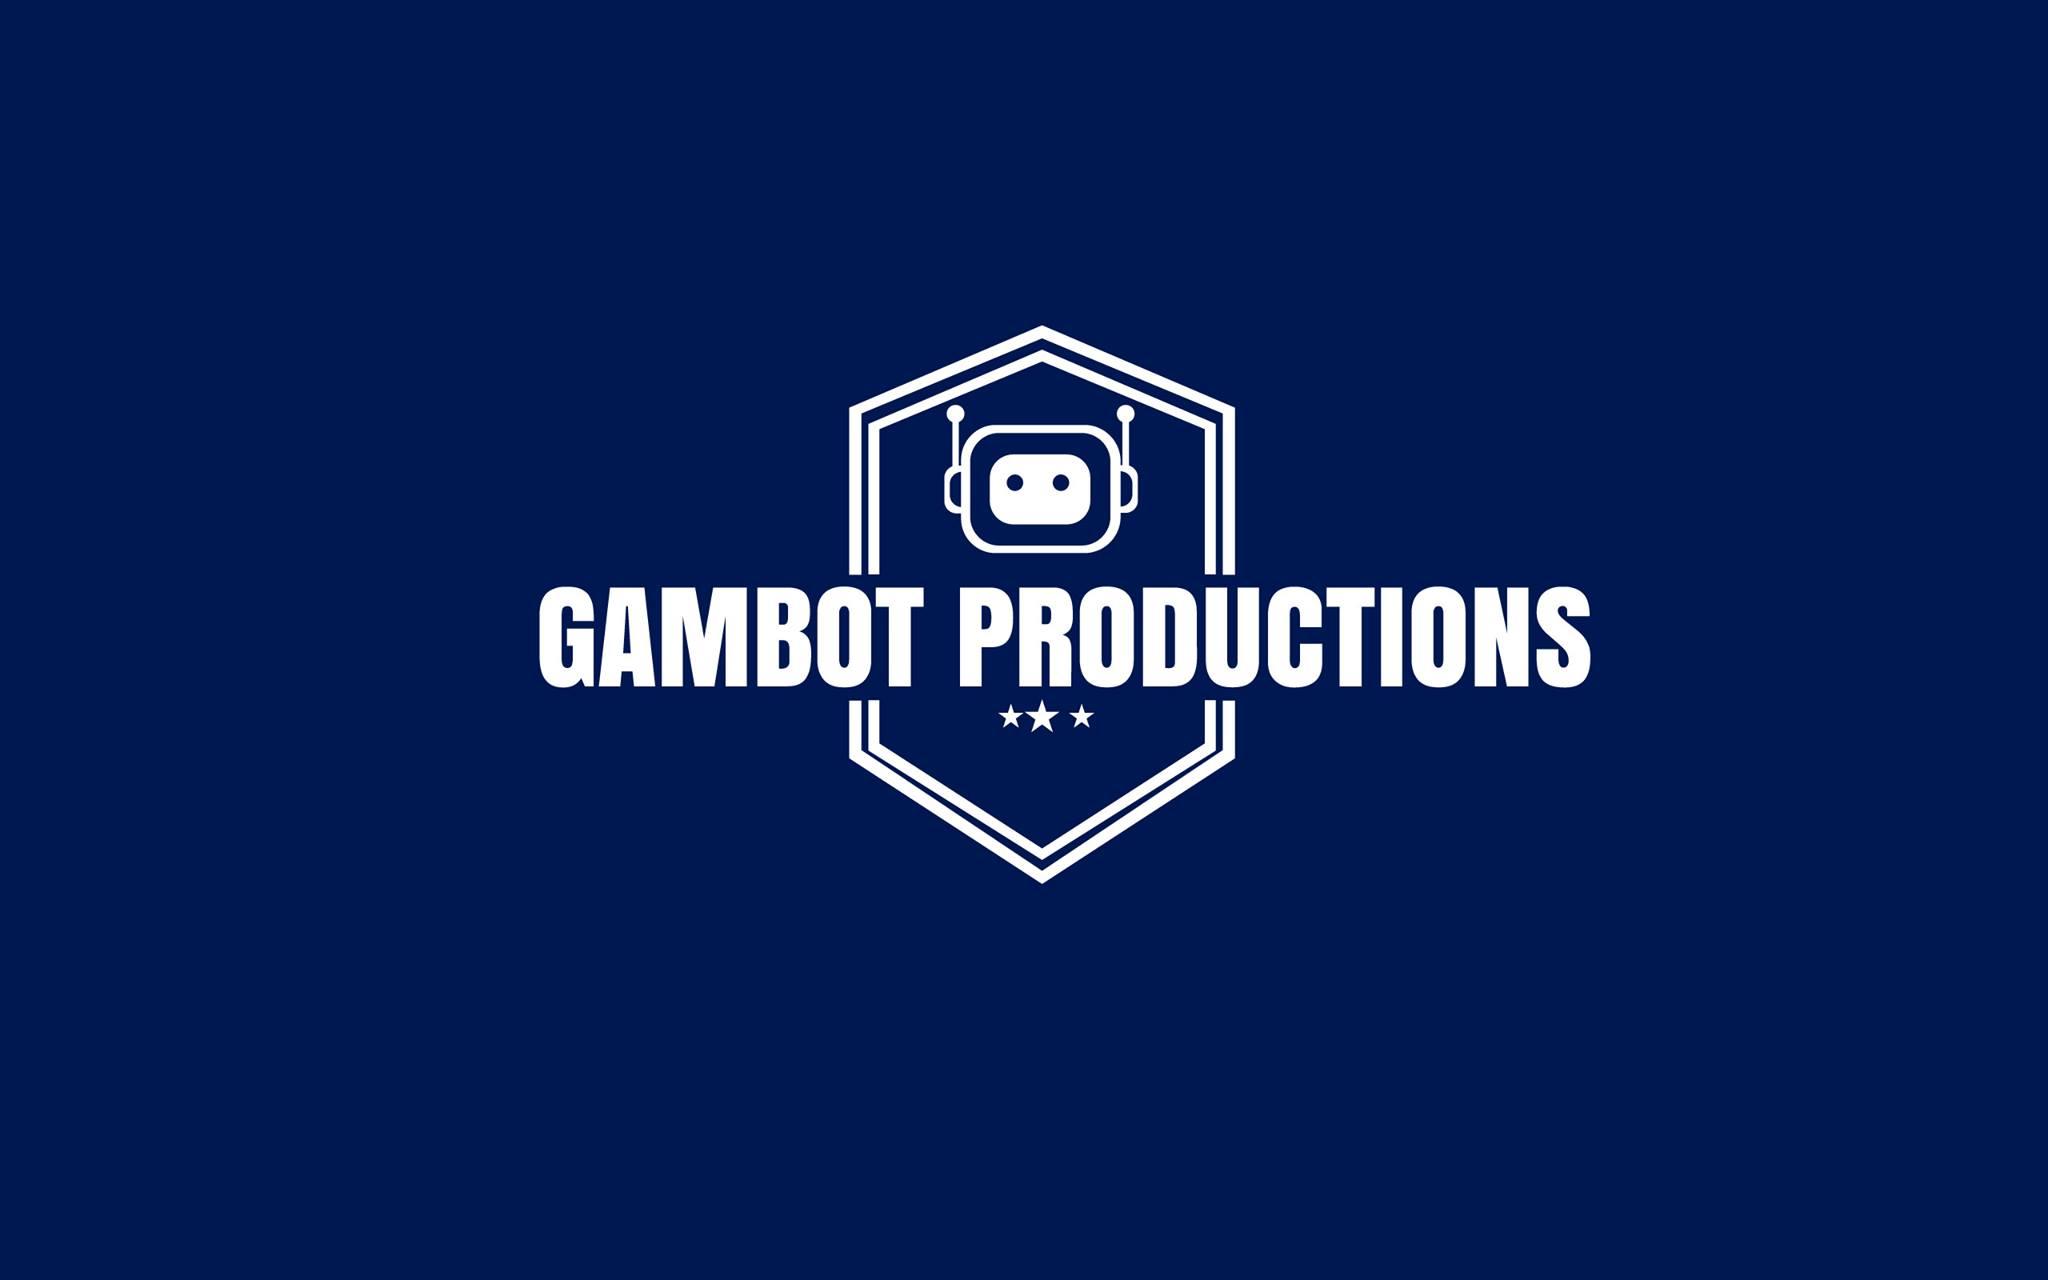 gambot productions.jpg